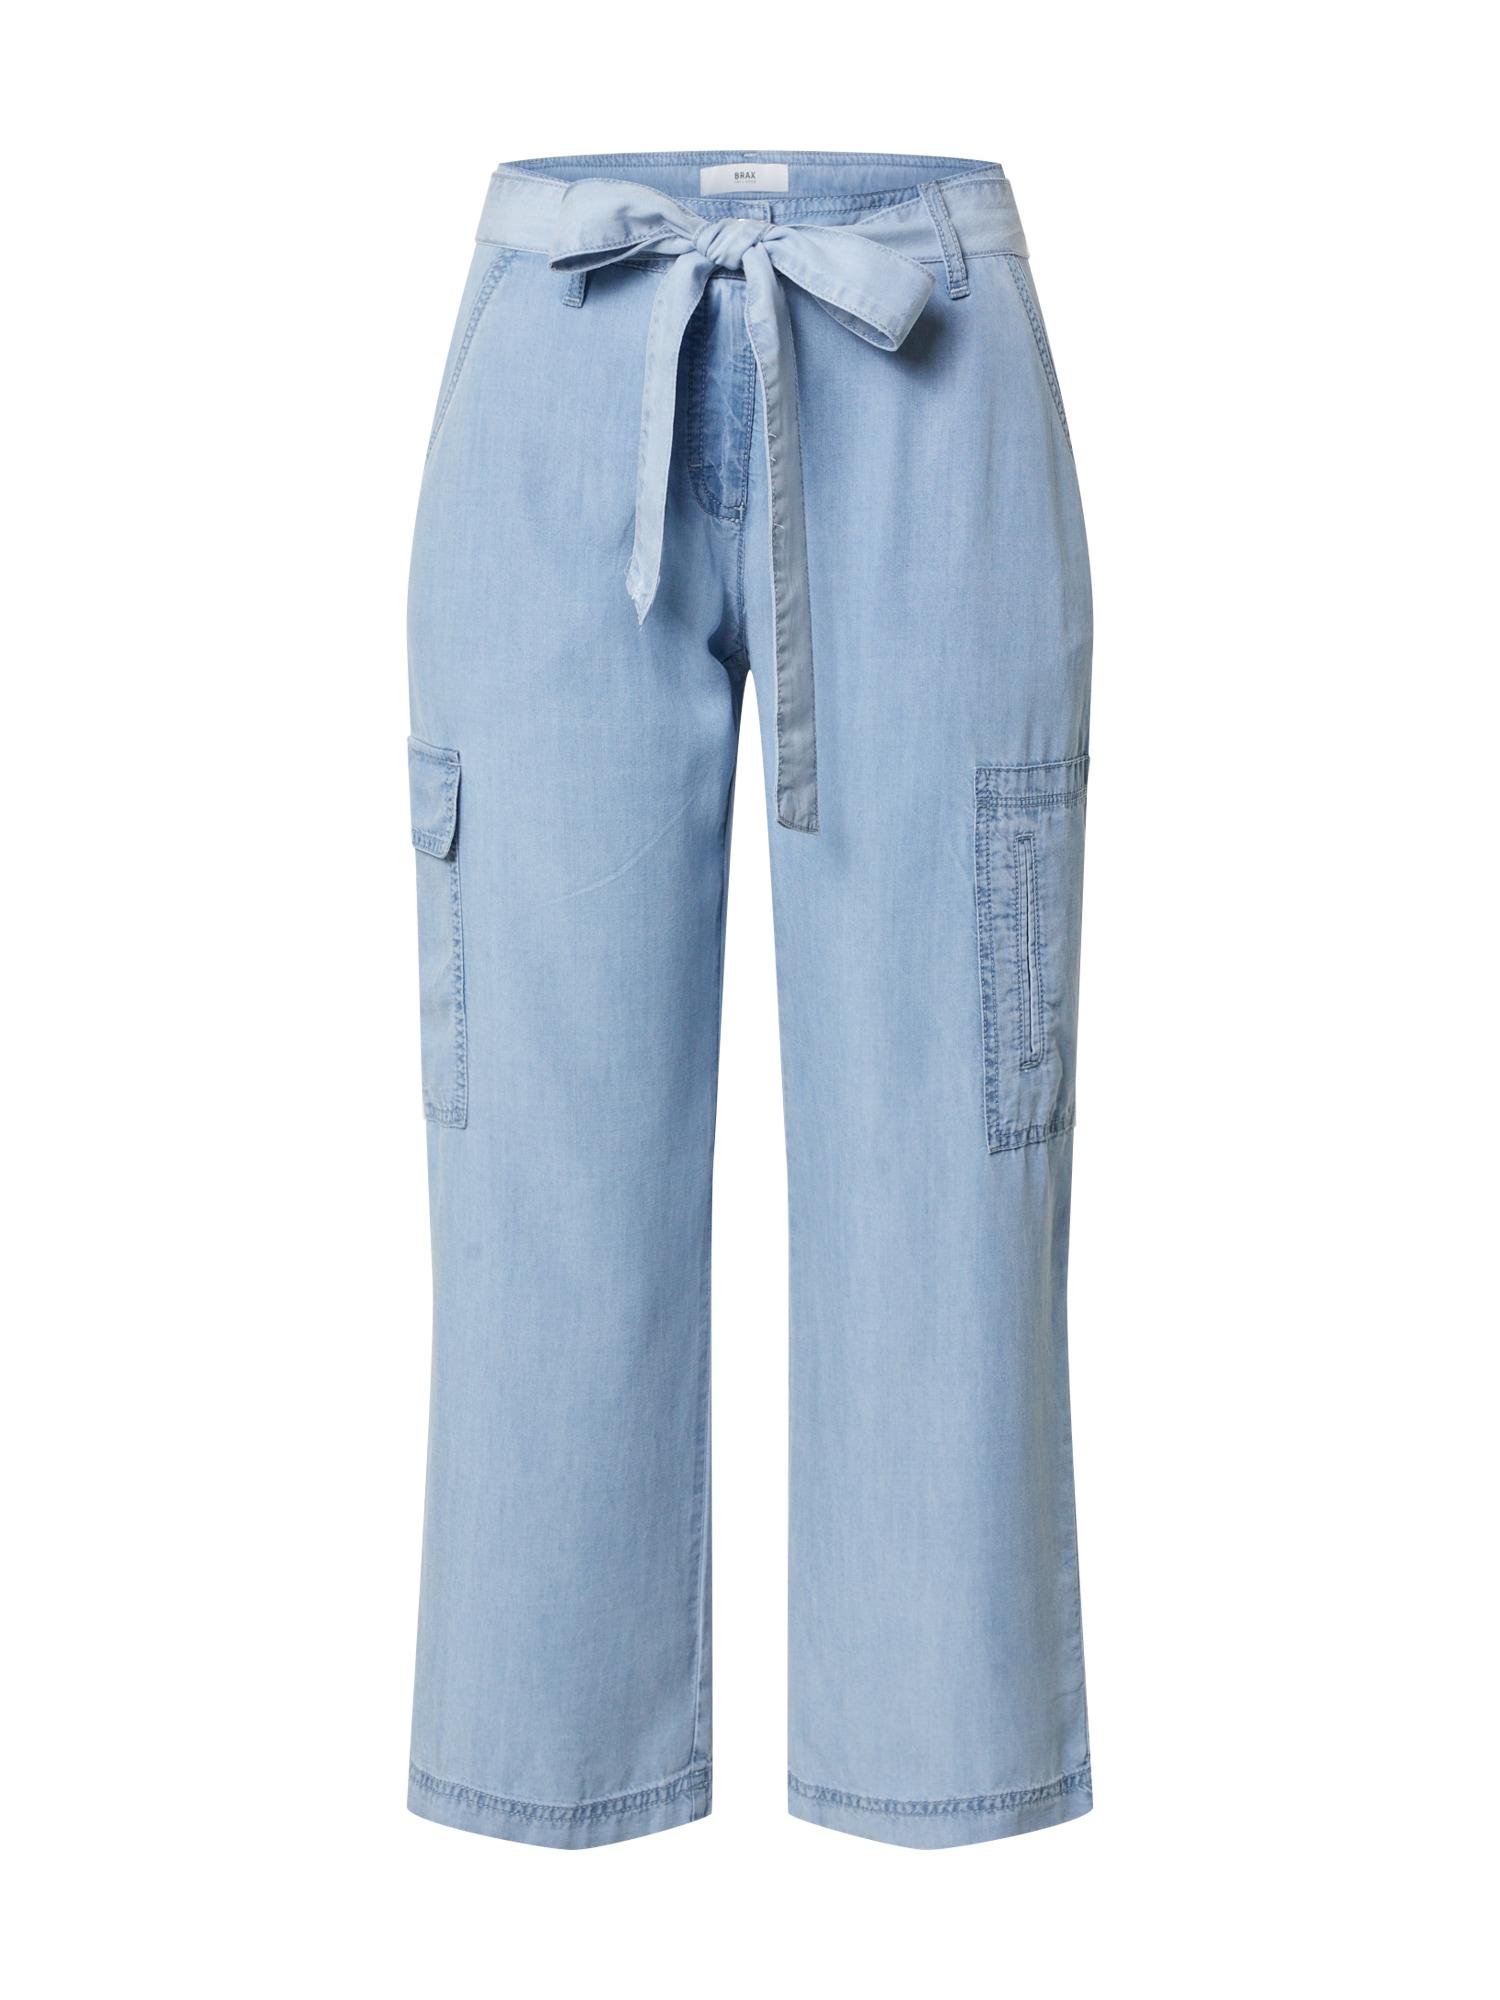 BRAX Džinsai 'MAINE S' tamsiai (džinso) mėlyna / šviesiai mėlyna